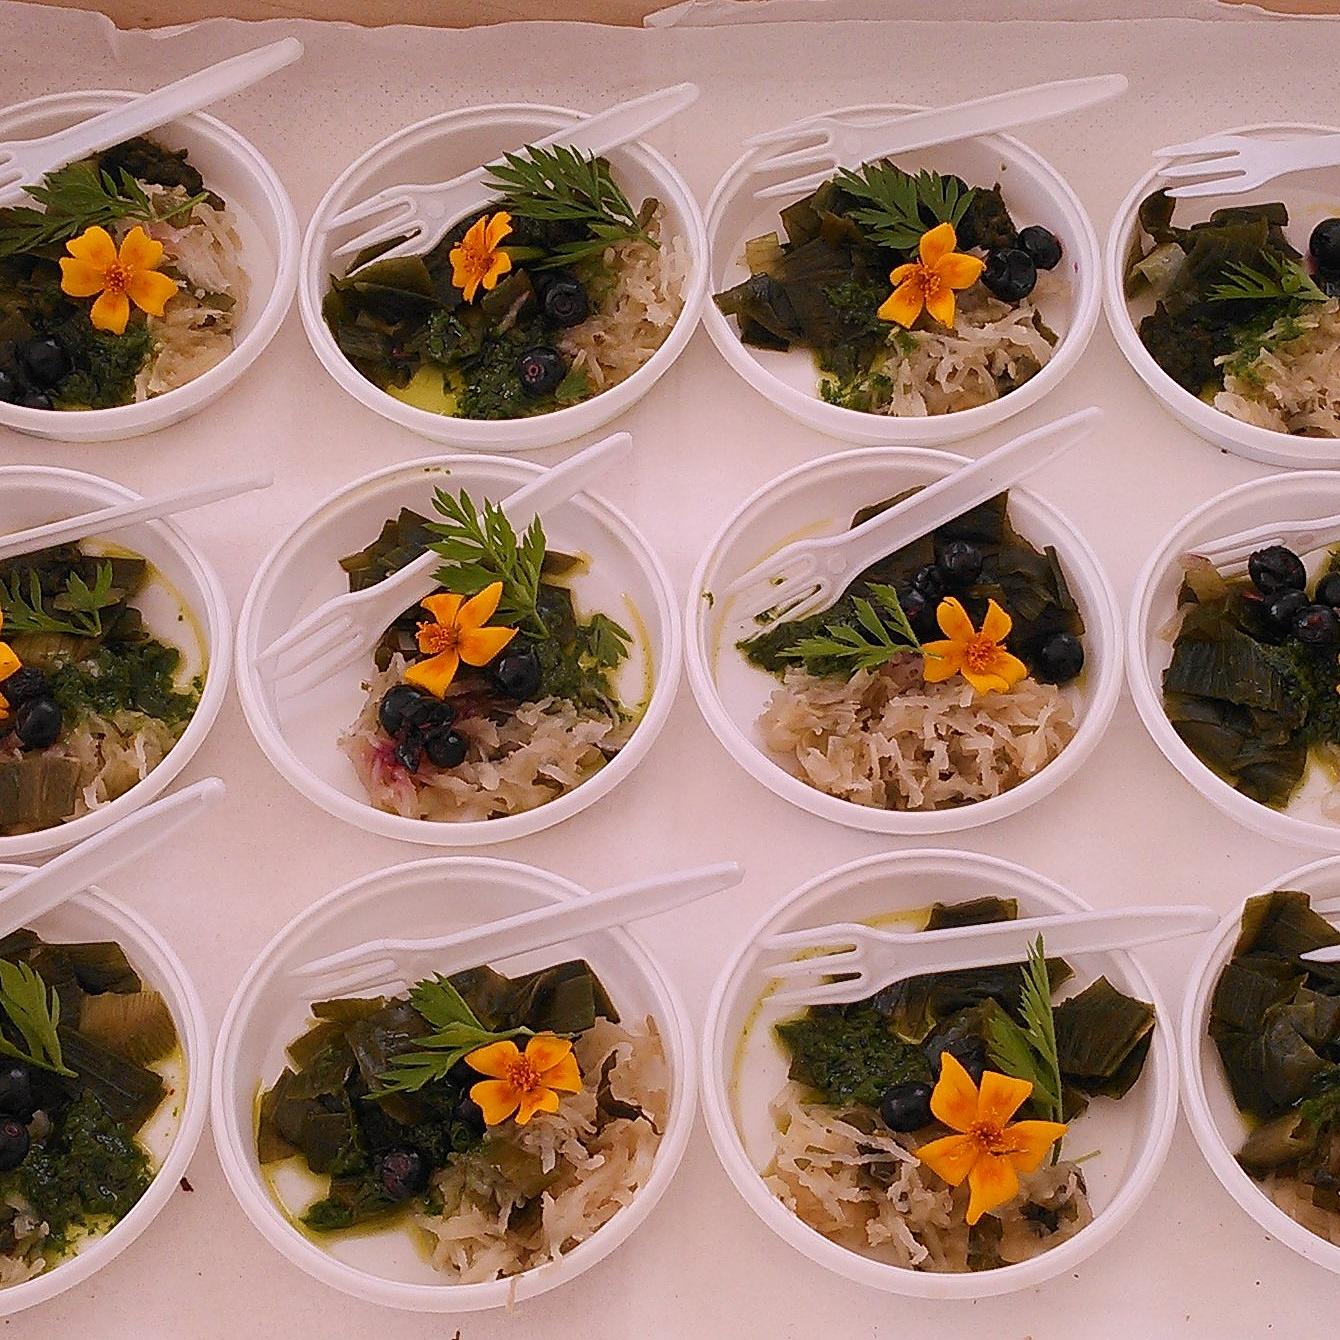 Smaksprøver på melkesyregjæret 1. rotgrønnsaker krydret med brennesle, 2. løkstilker, 3. ramsløk og 4. blåbær. Servert sammen med ramsløkolje, gulrotgress og blomst av kryddtagetes